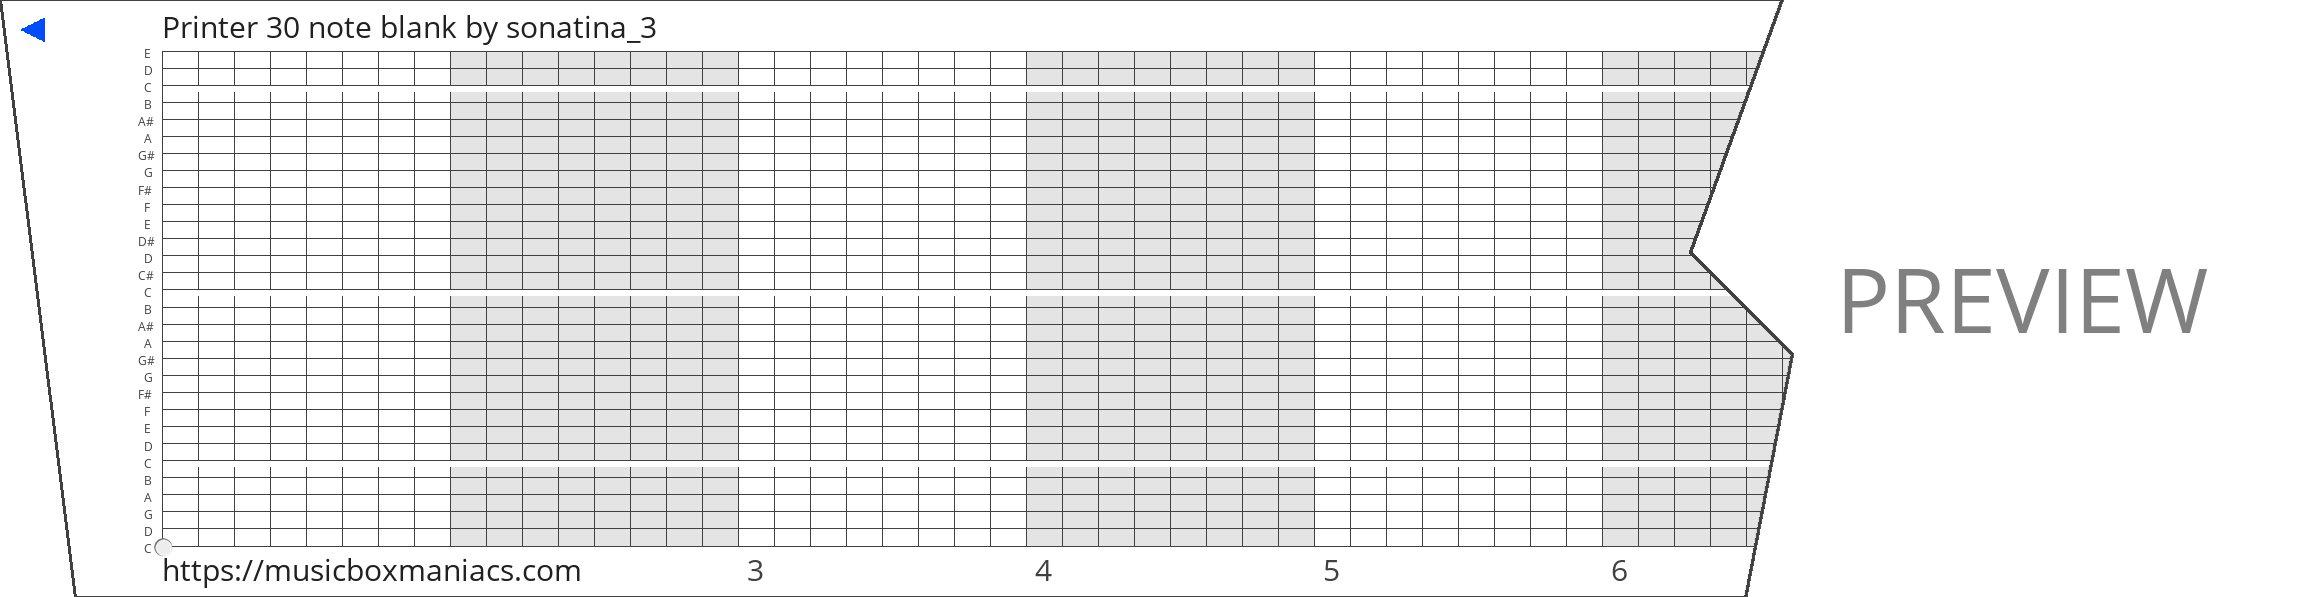 Printer 30 note blank 30 note music box paper strip